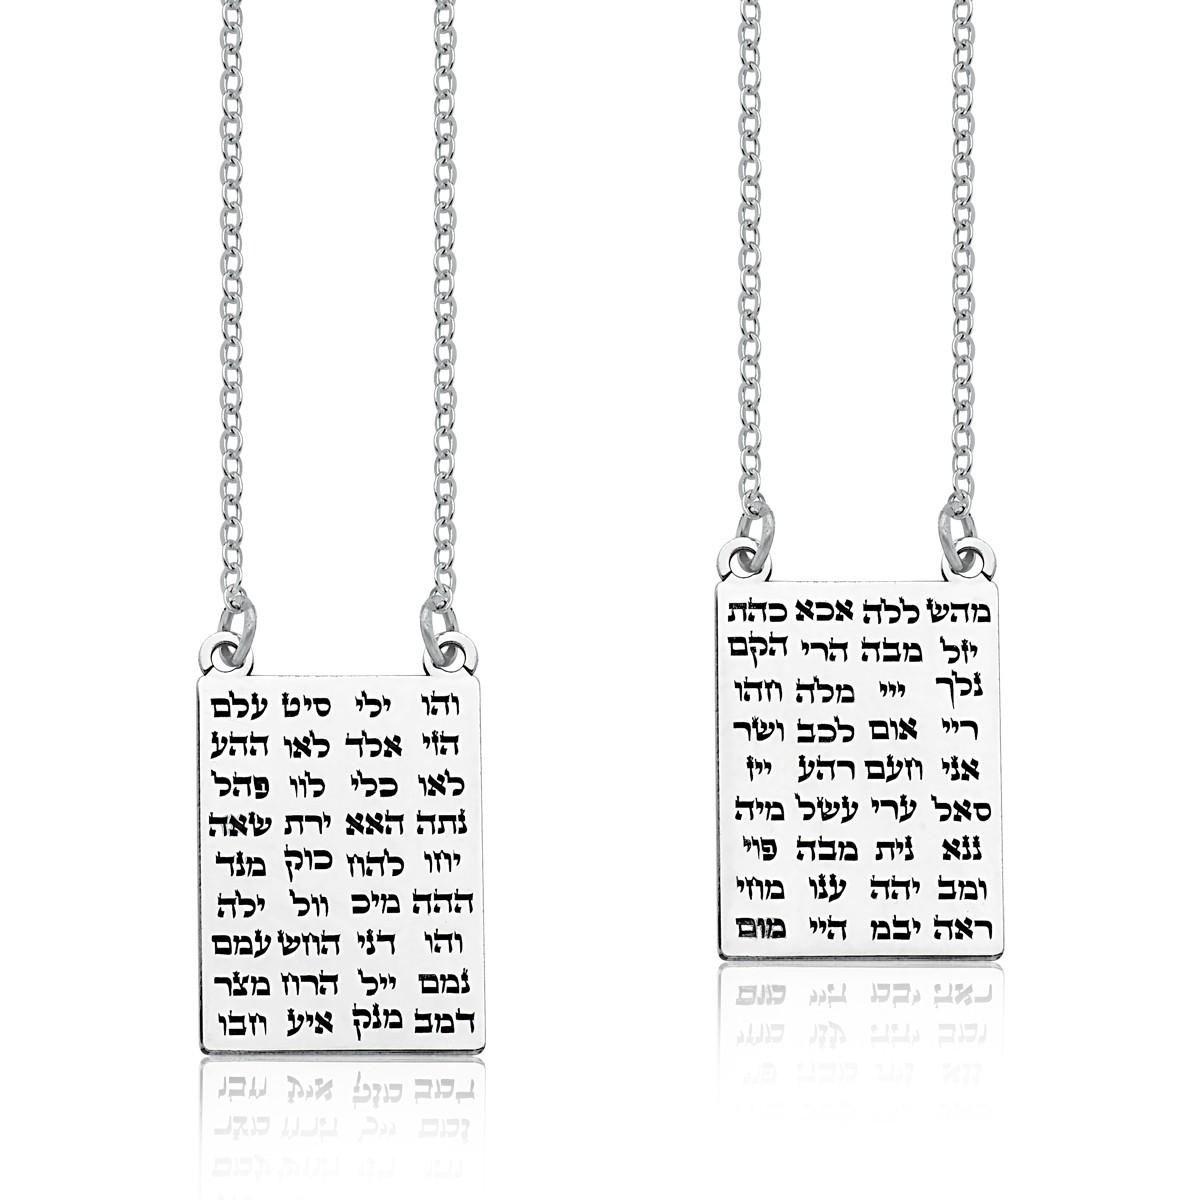 Escapulário Judaico Letras Hebraicas